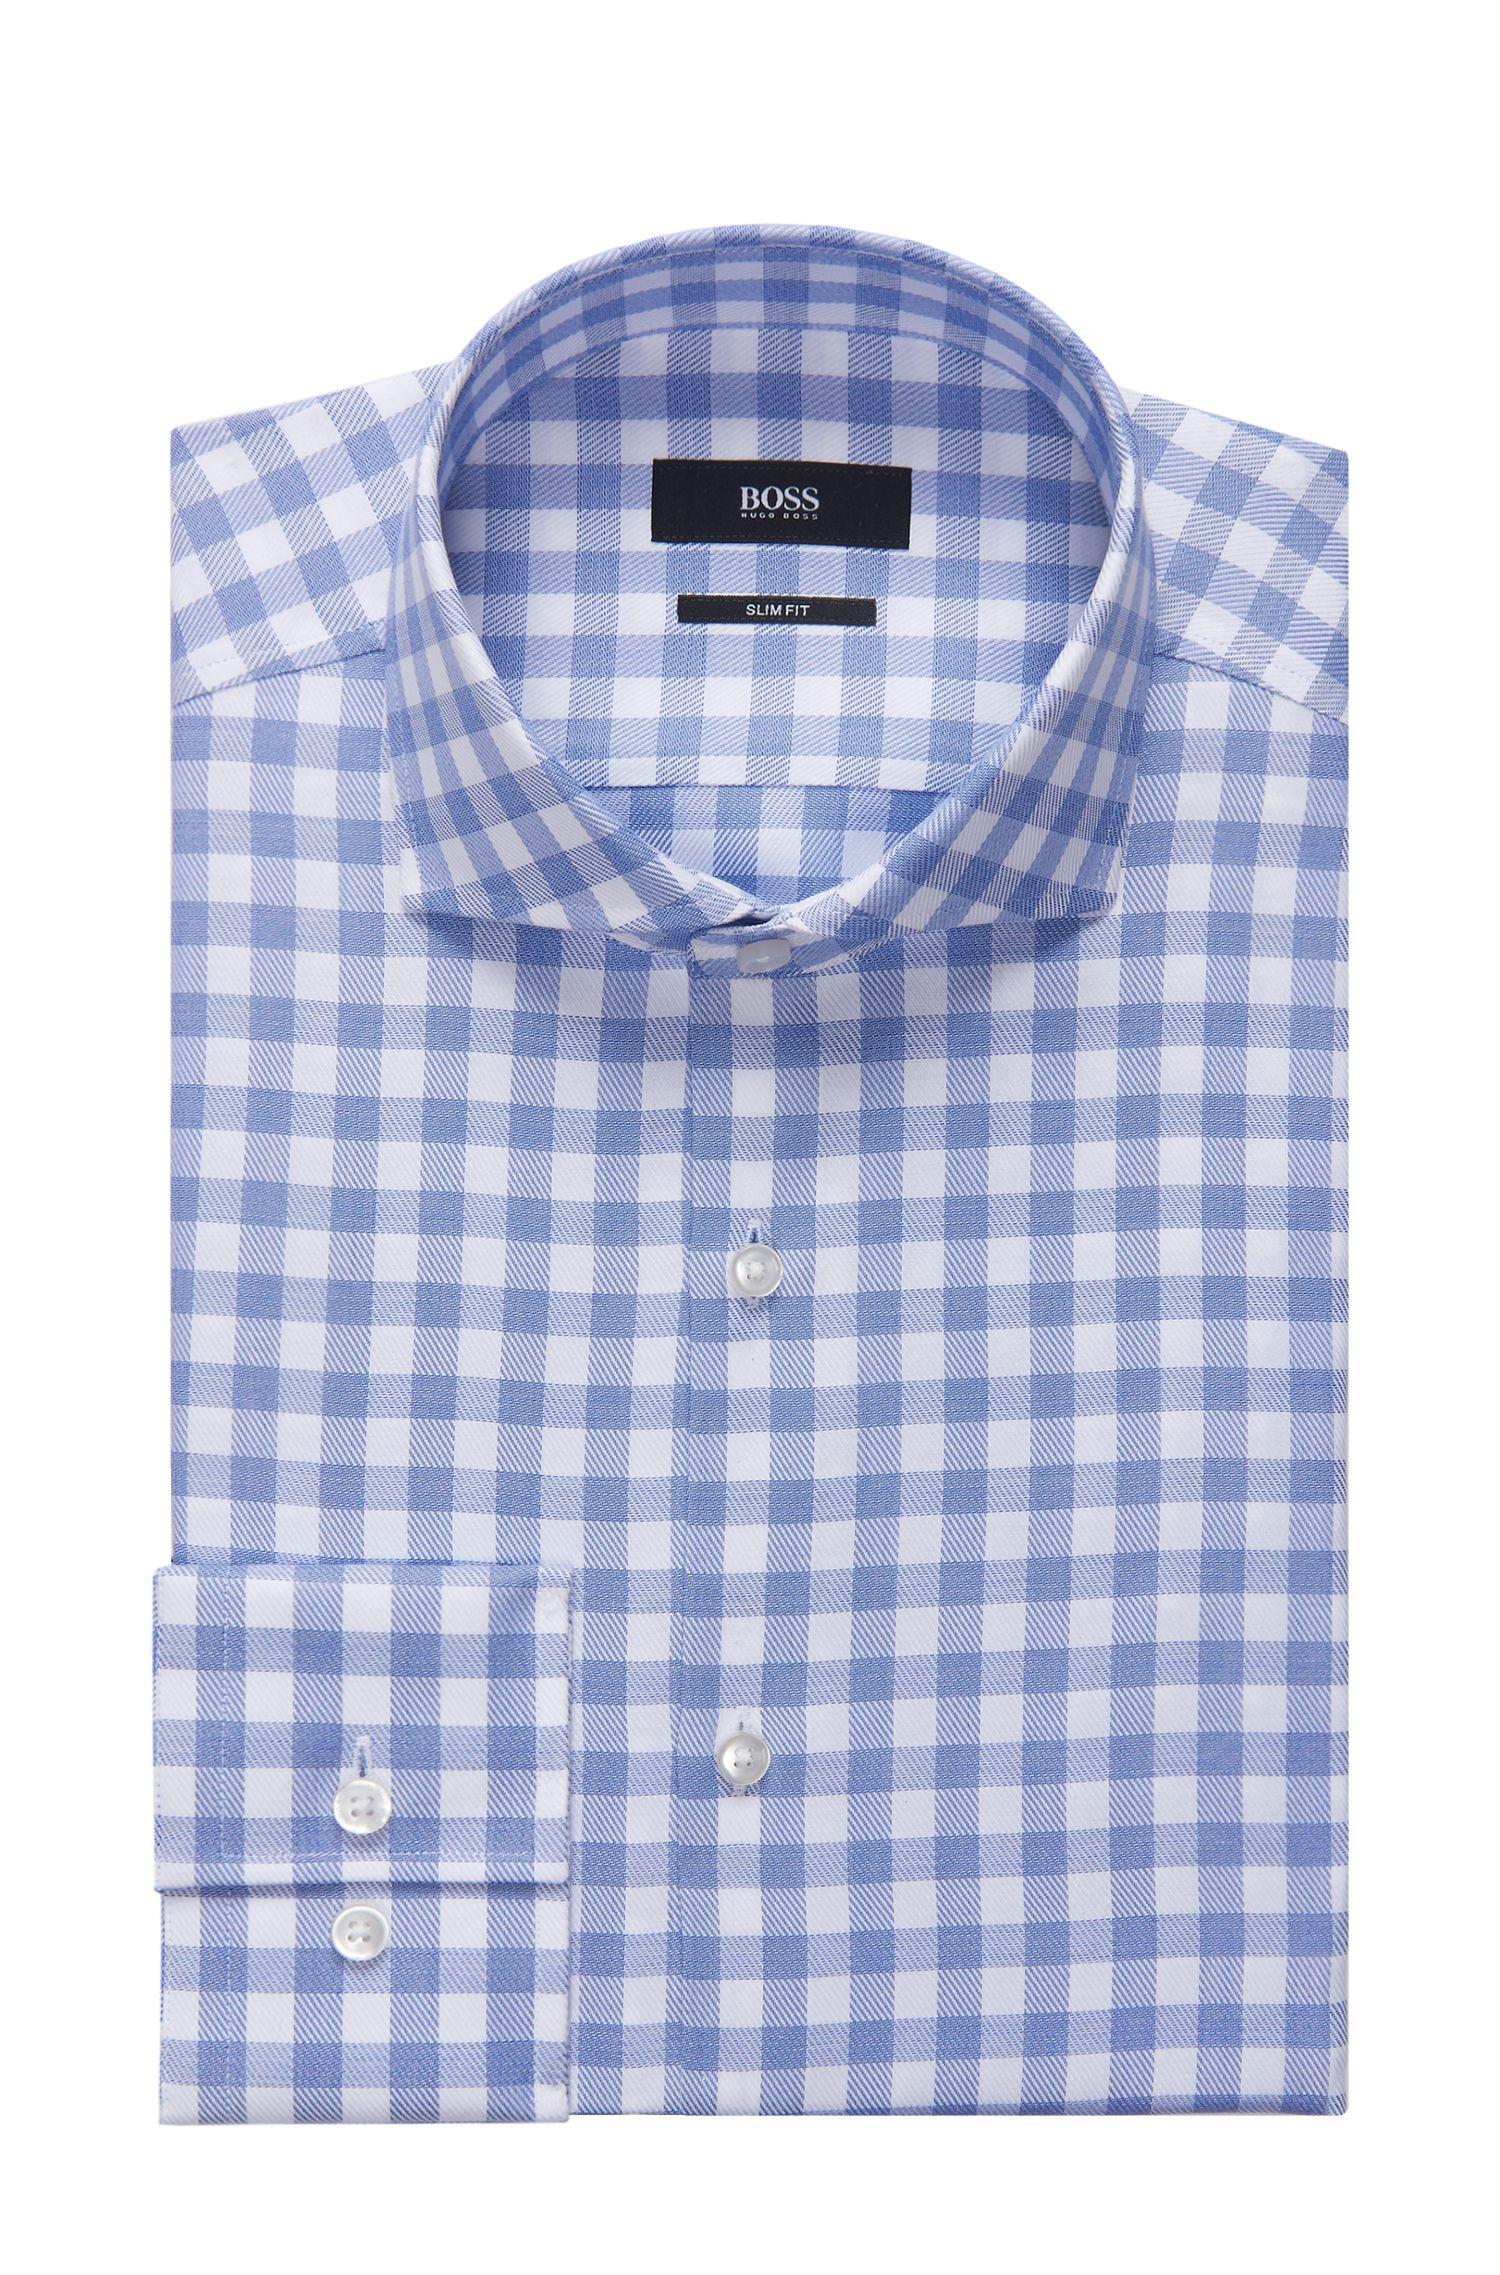 Sheperd's Check Cotton Dress Shirt, Slim Fit | Jason